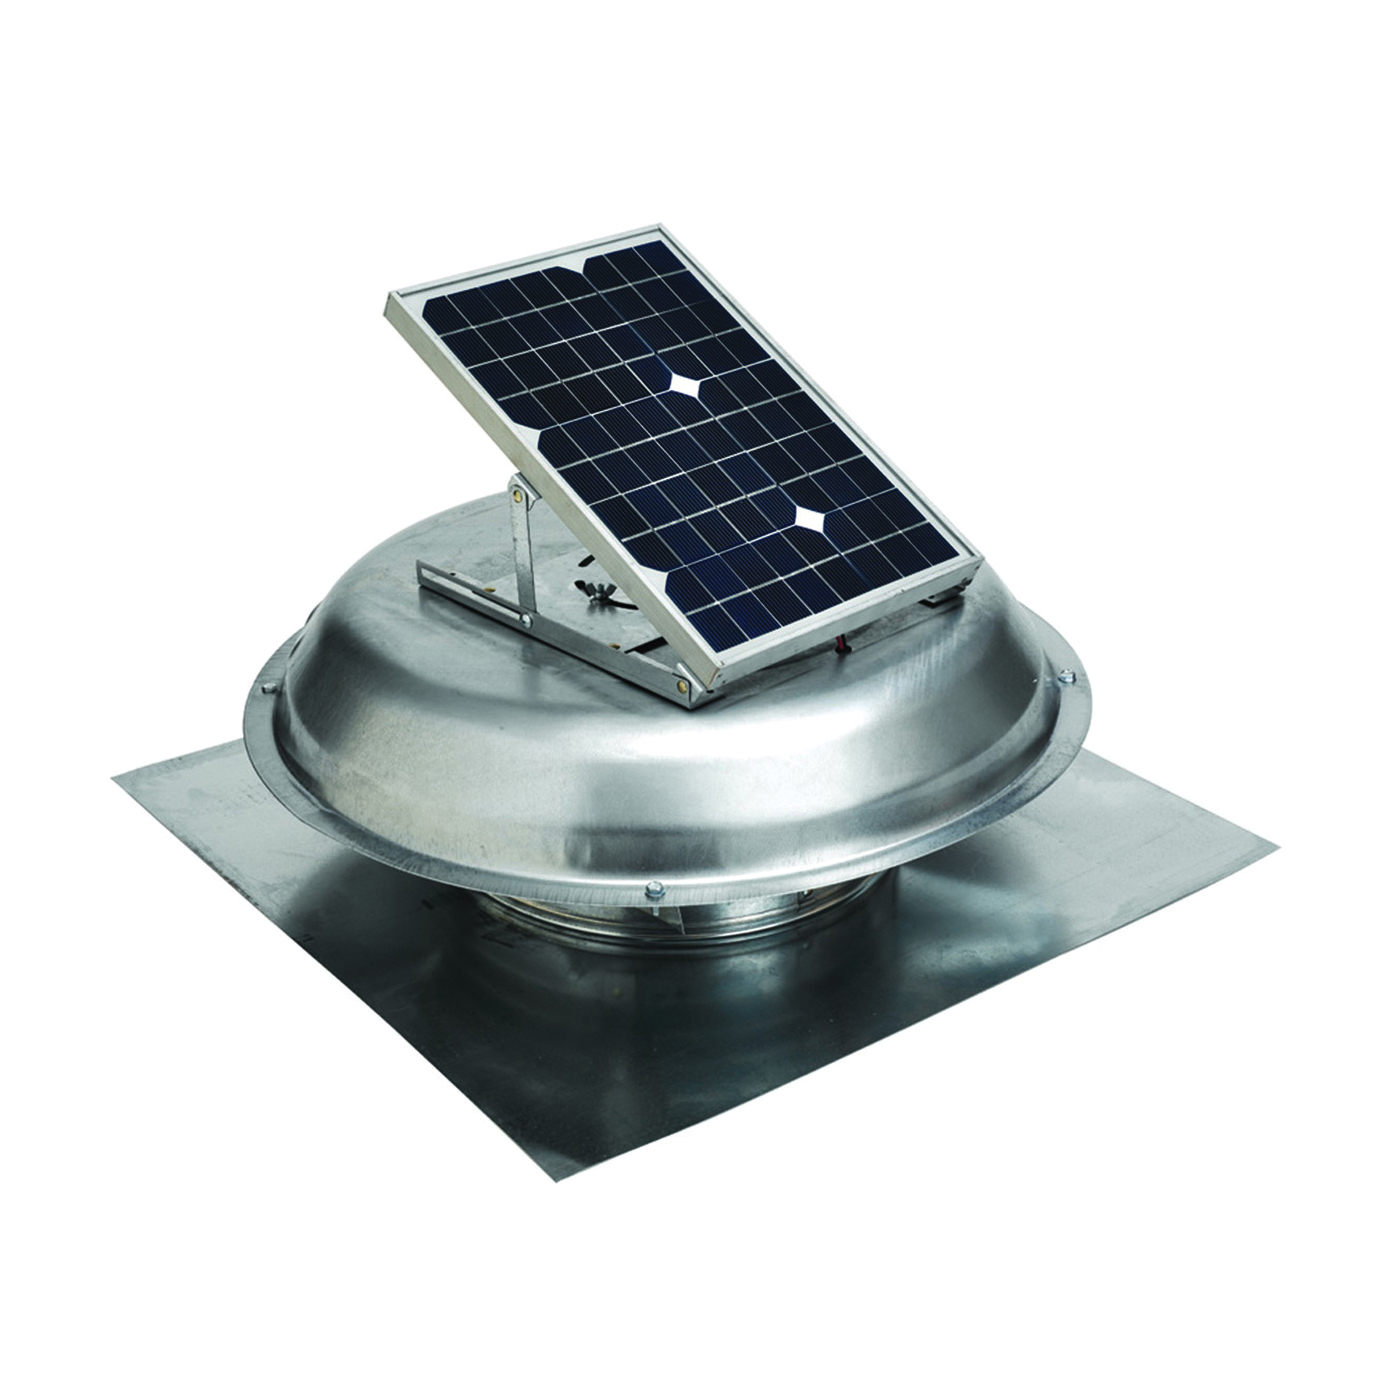 Picture of Master Flow PRSOLAR Roof Ventilator, 800 sq-ft Net Free Ventilating Area, 500 cfm Air, Steel